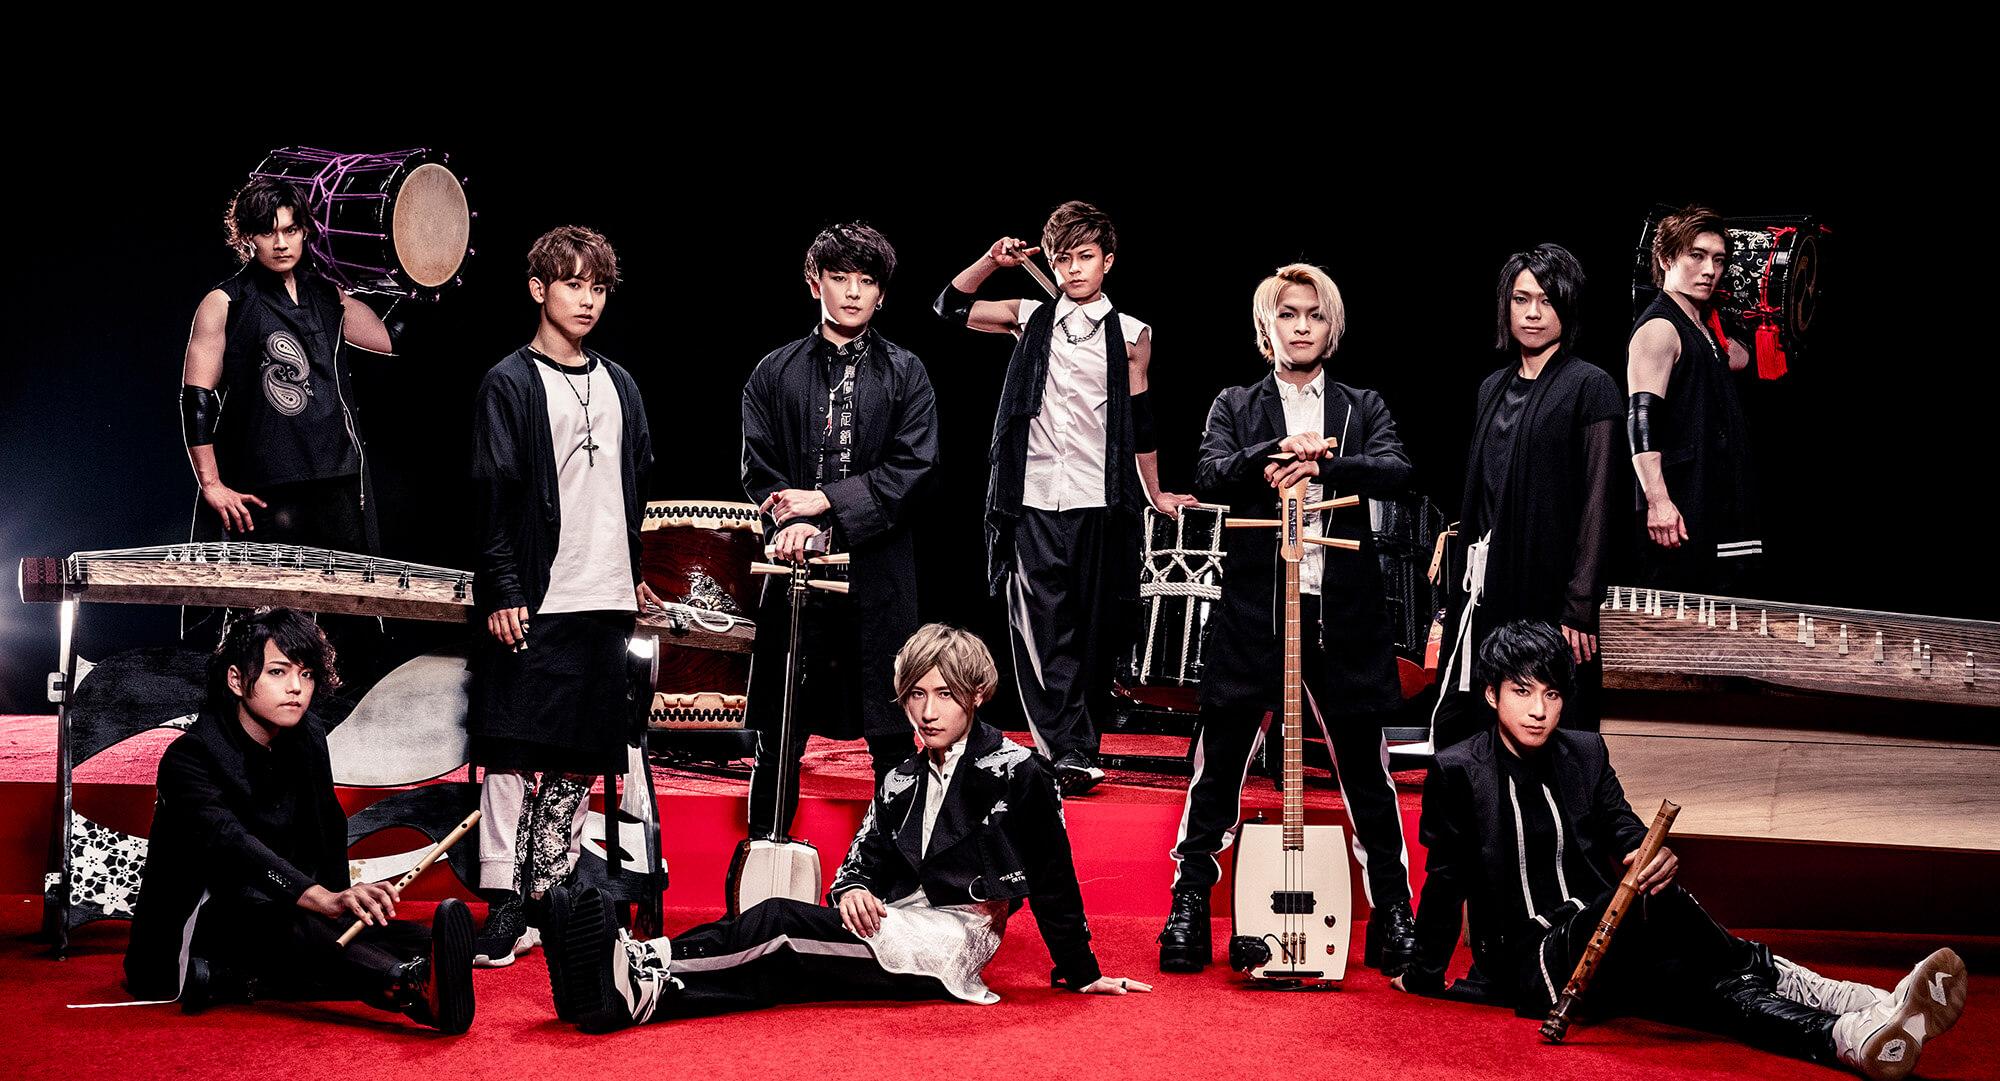 SOLIDEMO與桜men的協作樂曲決定成為TV動畫「黑色五葉草」第6單元ED主題曲 SOLIDEMO_、黑色五葉草、